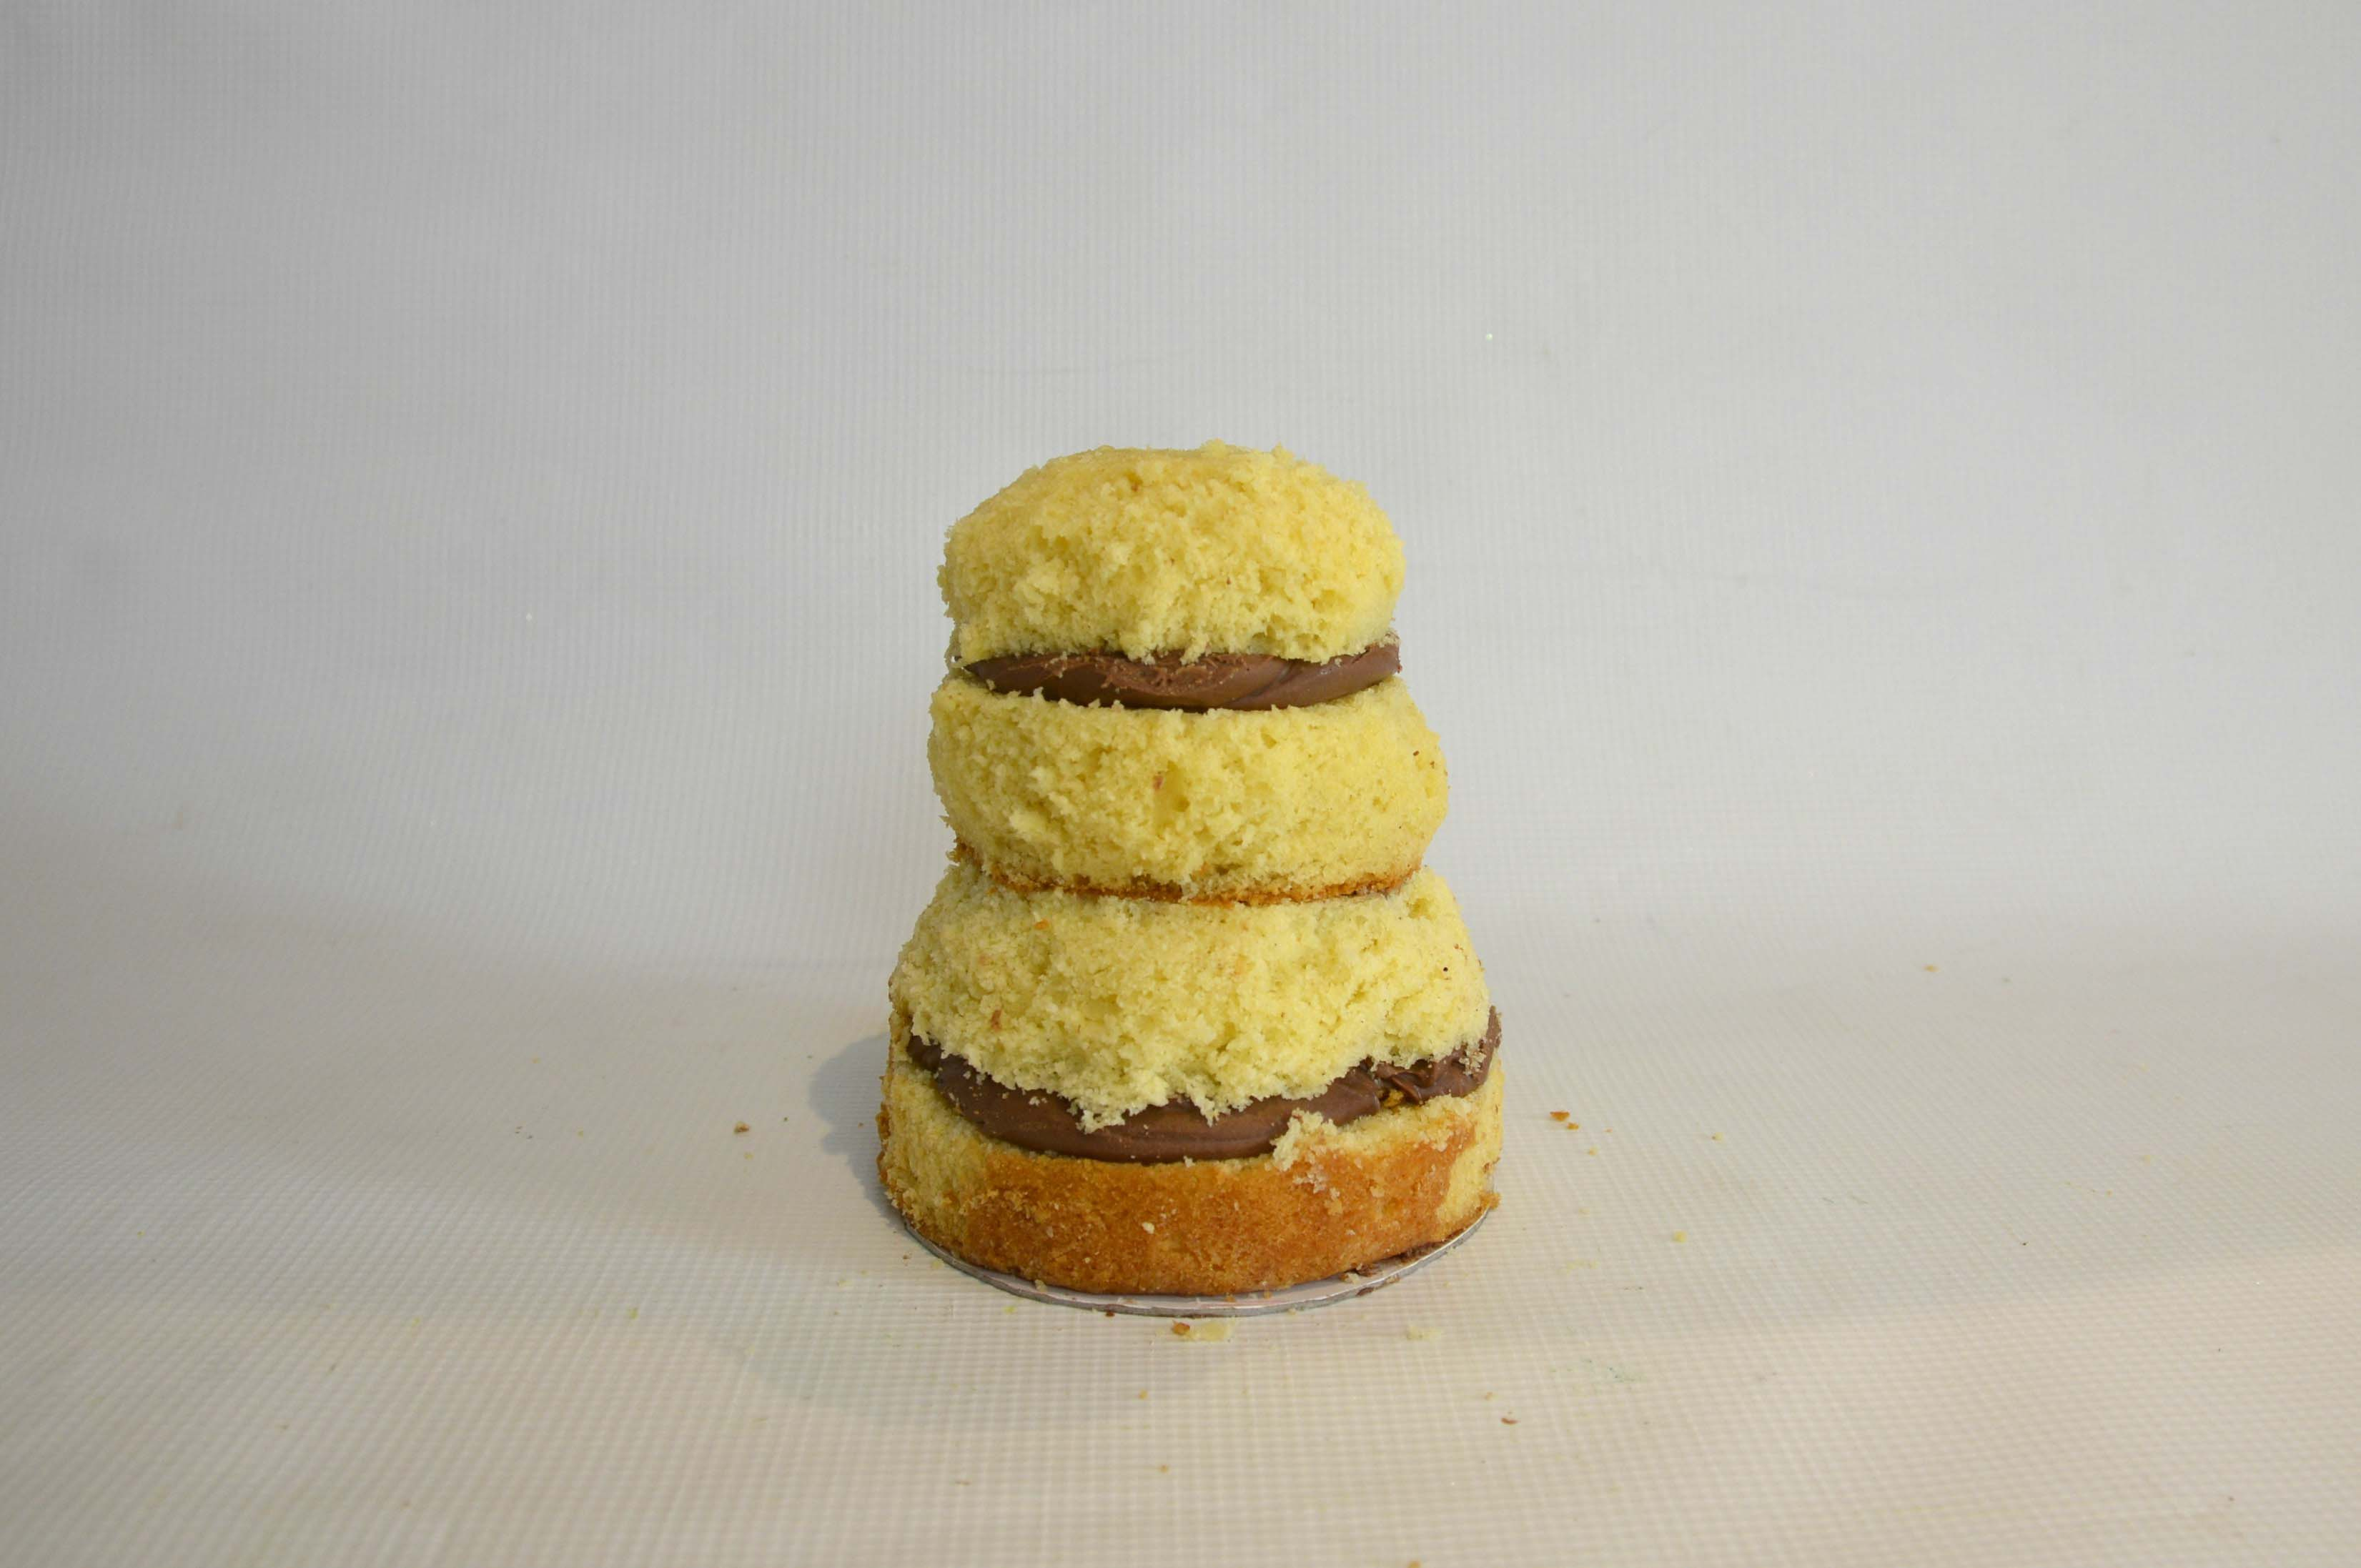 Cake in an hourglass shape